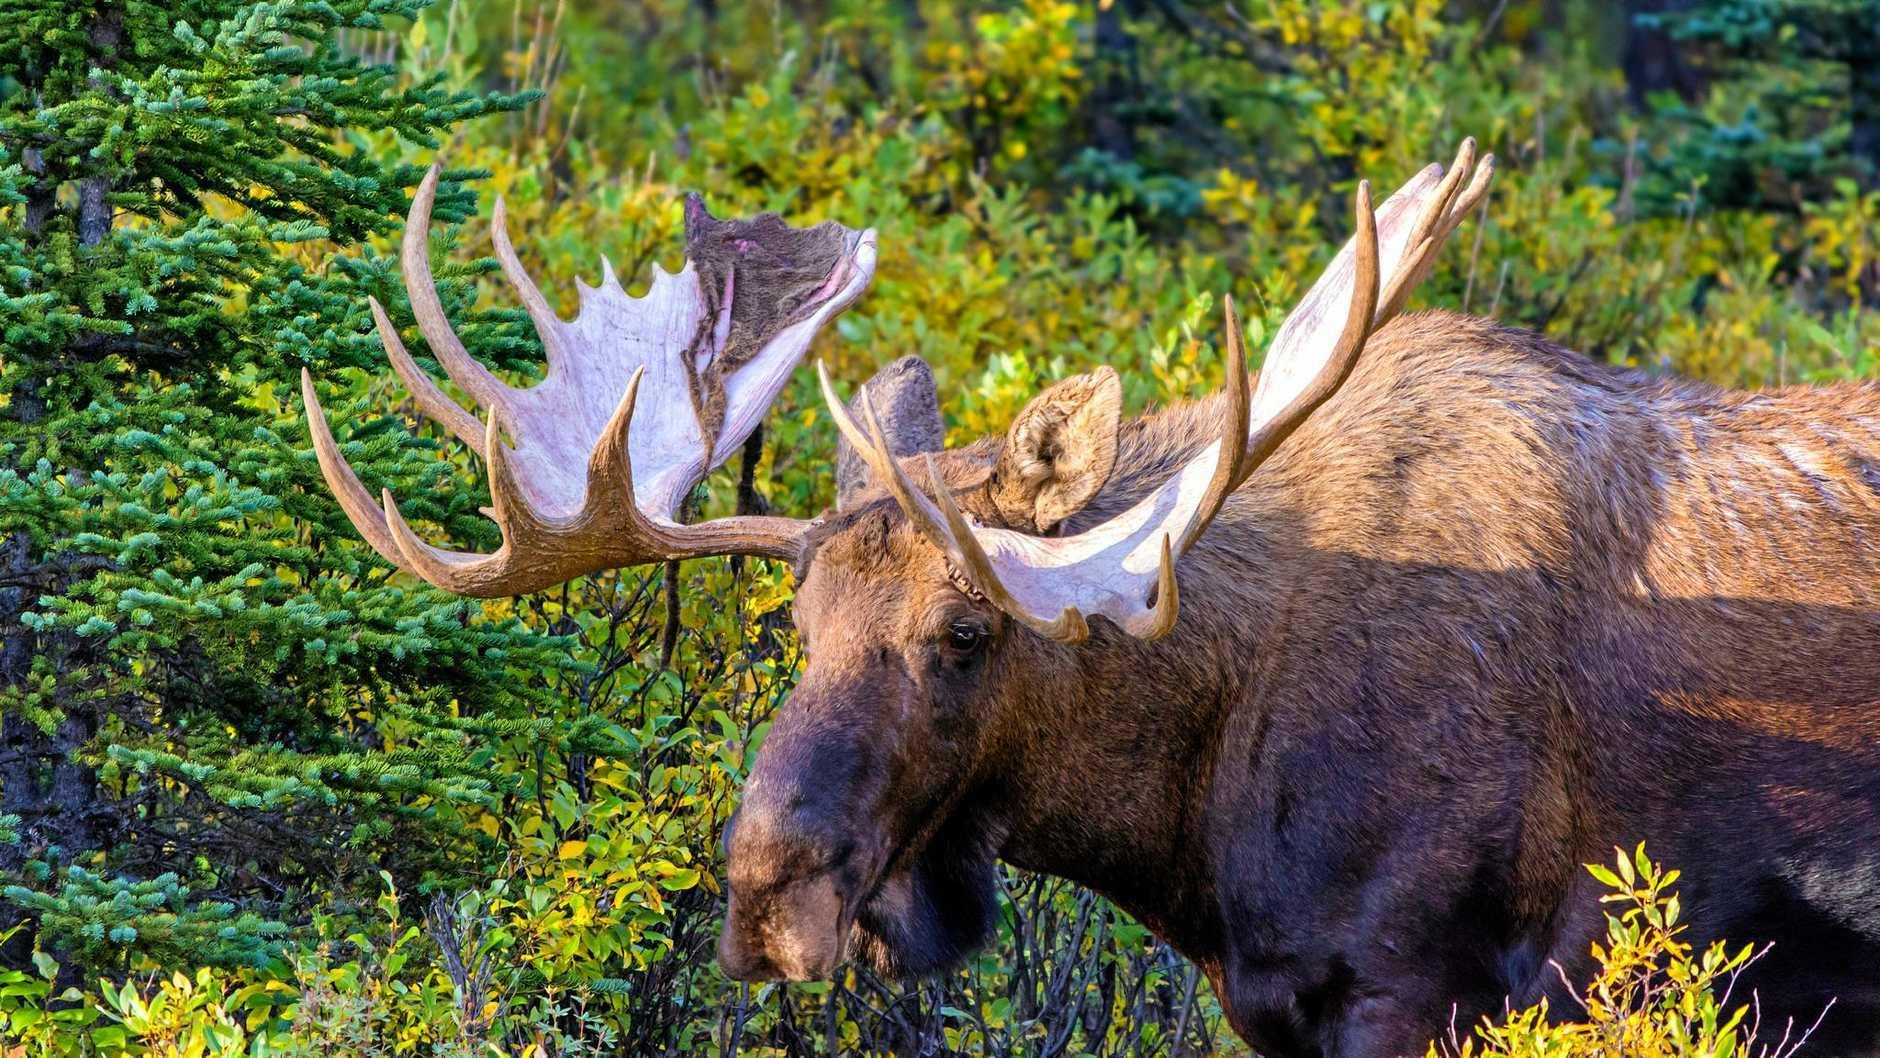 A bull moose (Alces alces) grazes on Autumn foliage in Denali National Park, Alaska.